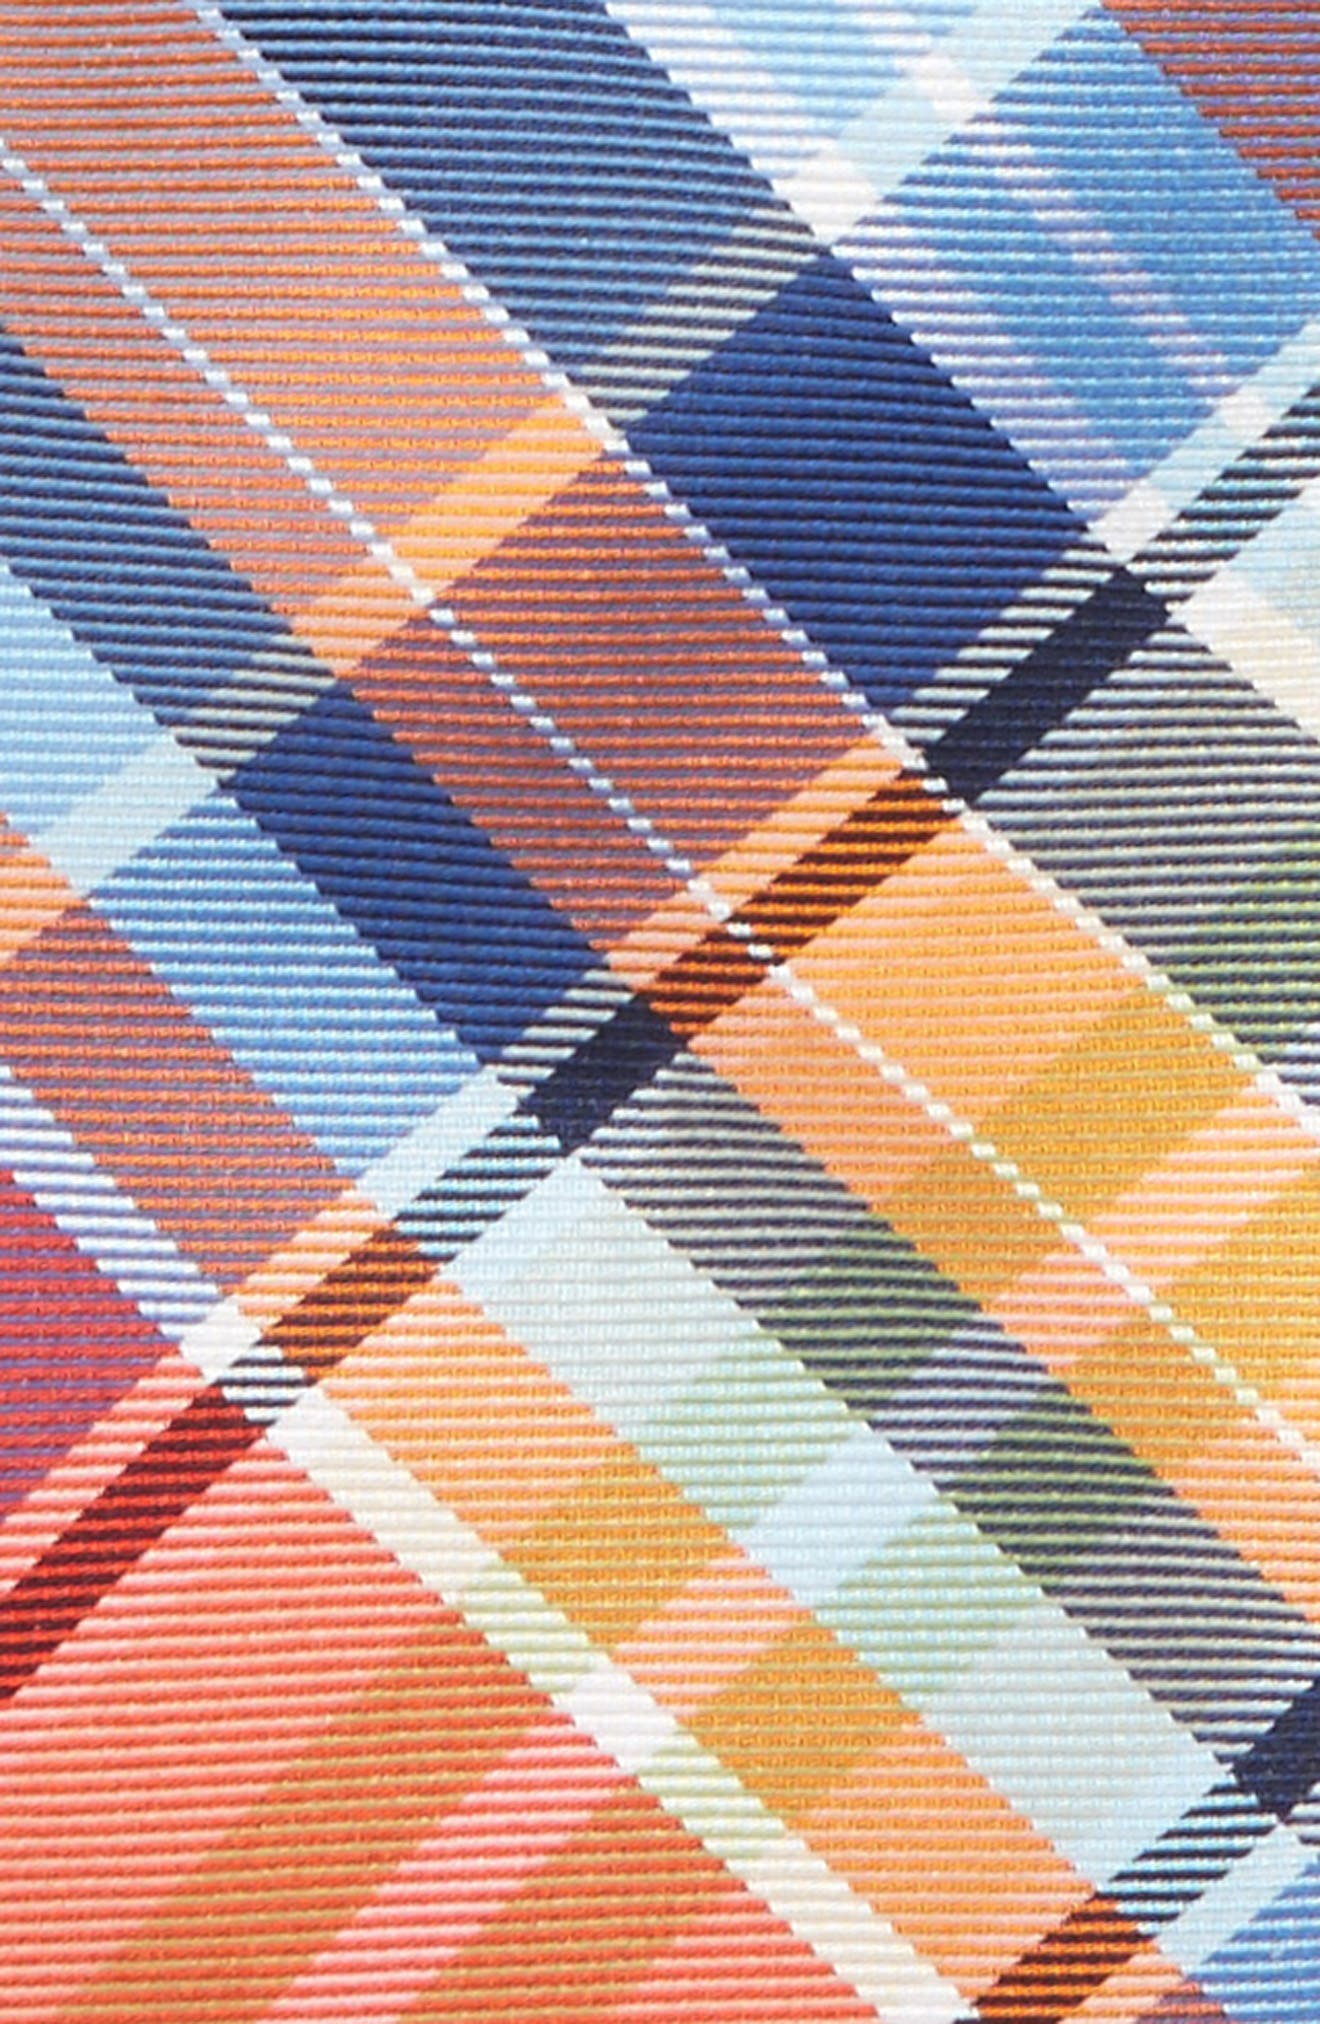 Plaid Silk Tie,                             Alternate thumbnail 2, color,                             Orange Plaid